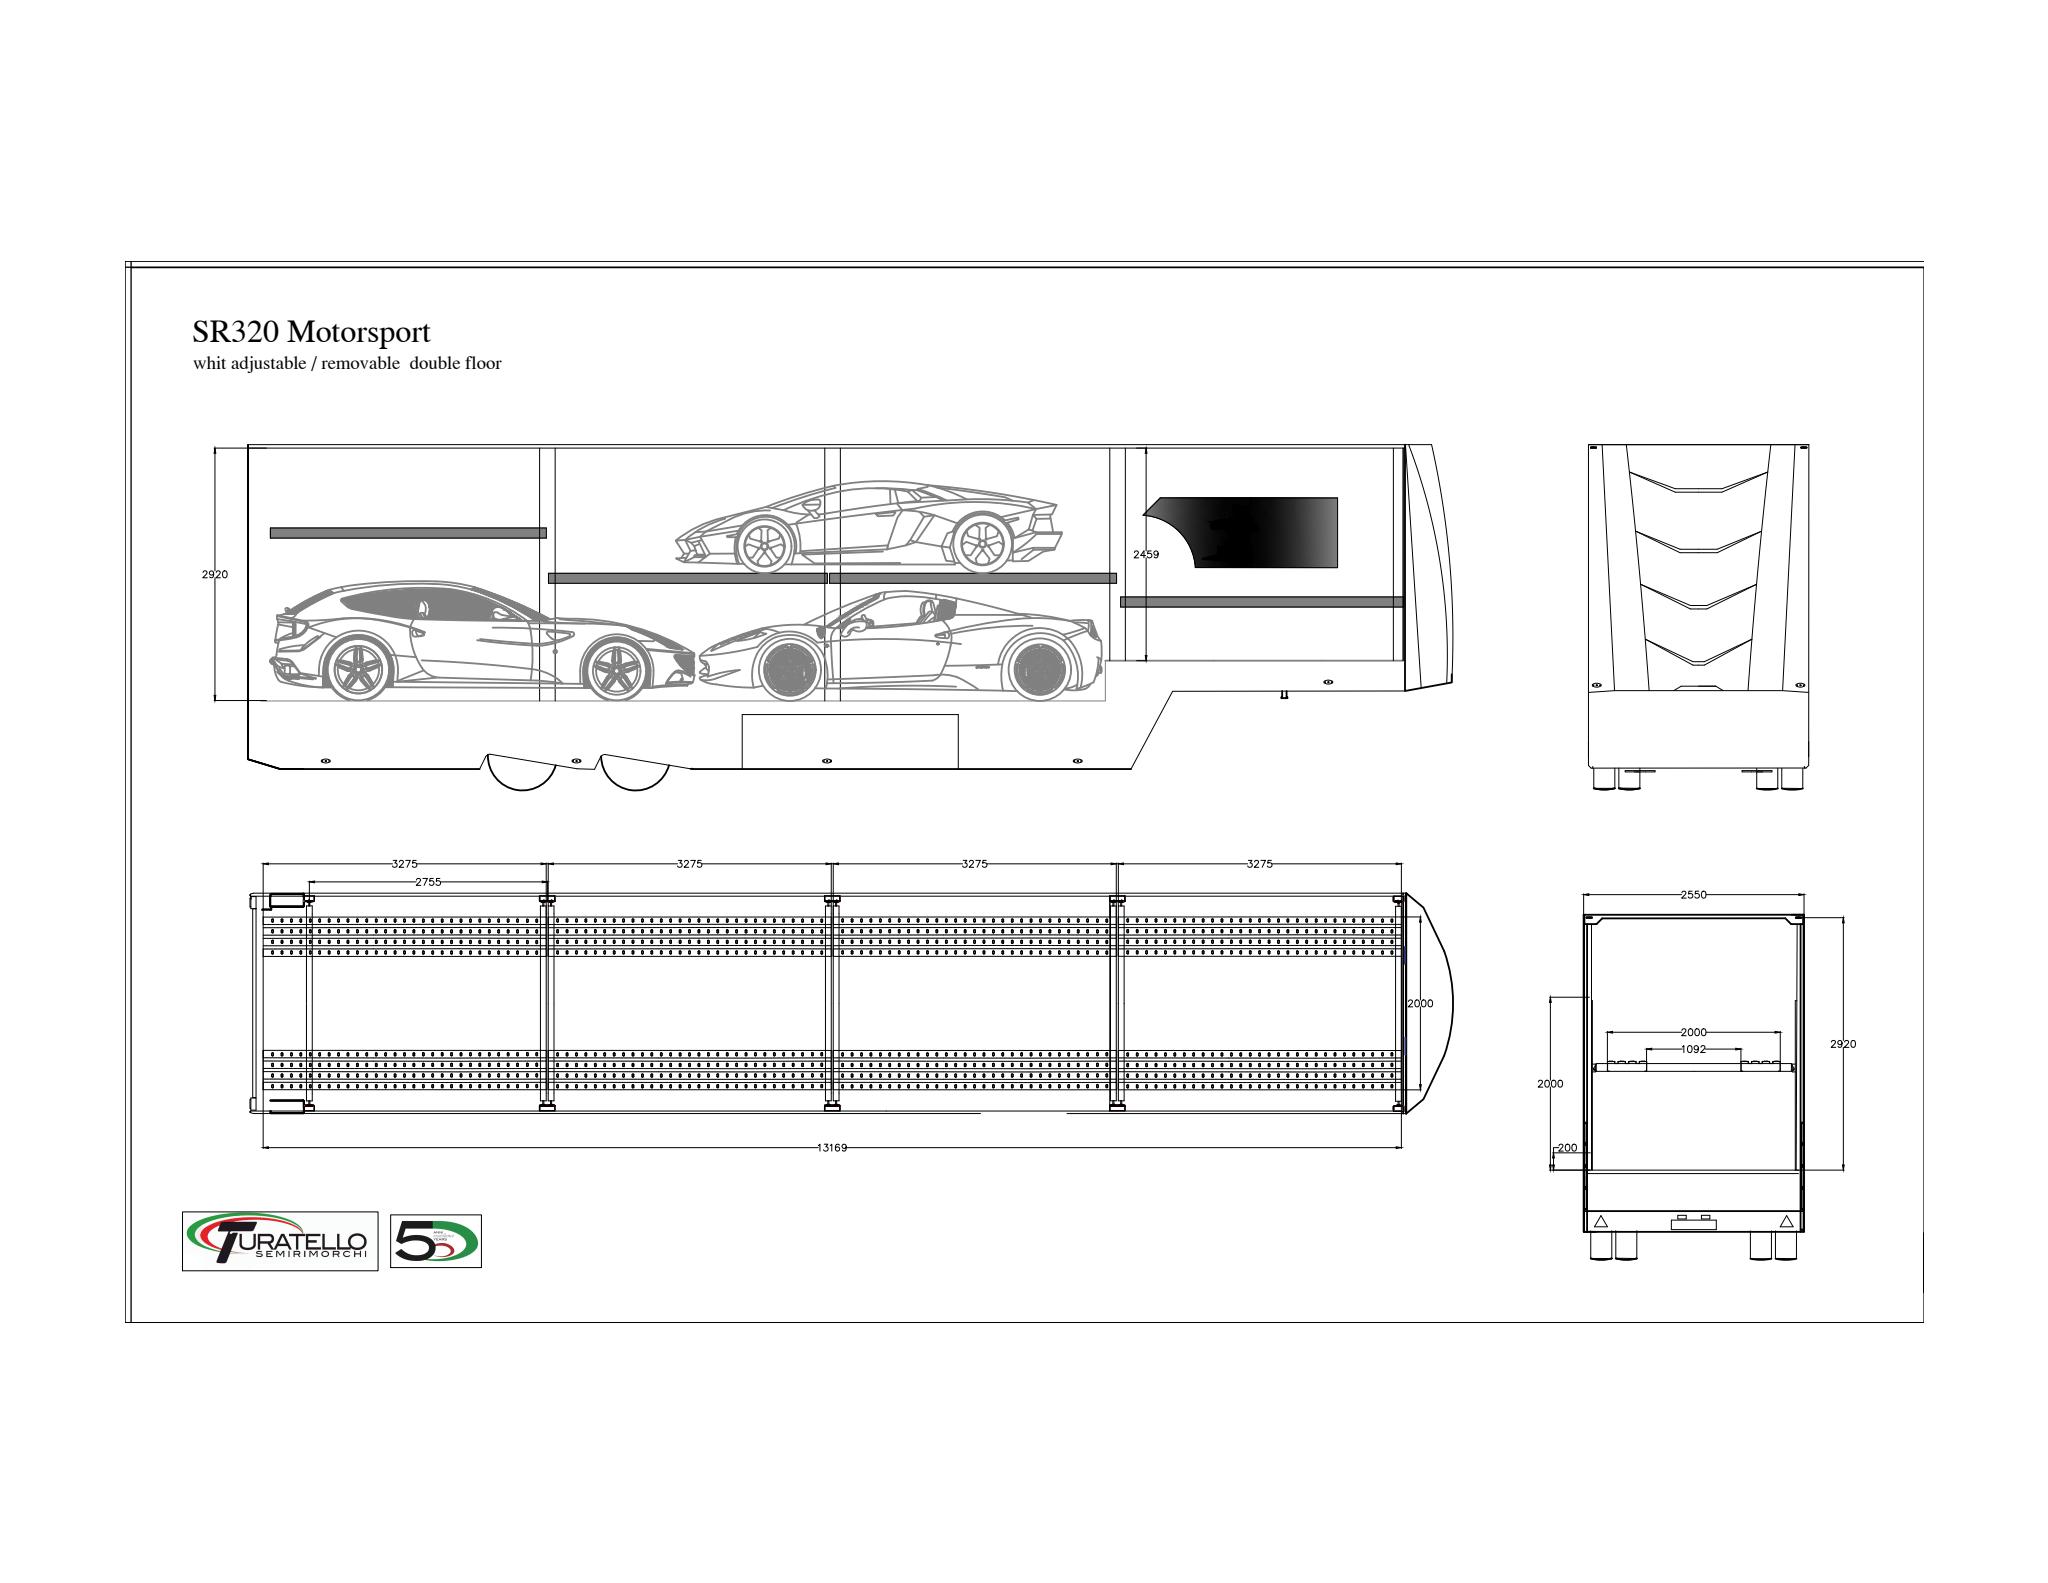 Sr320 Motorsport